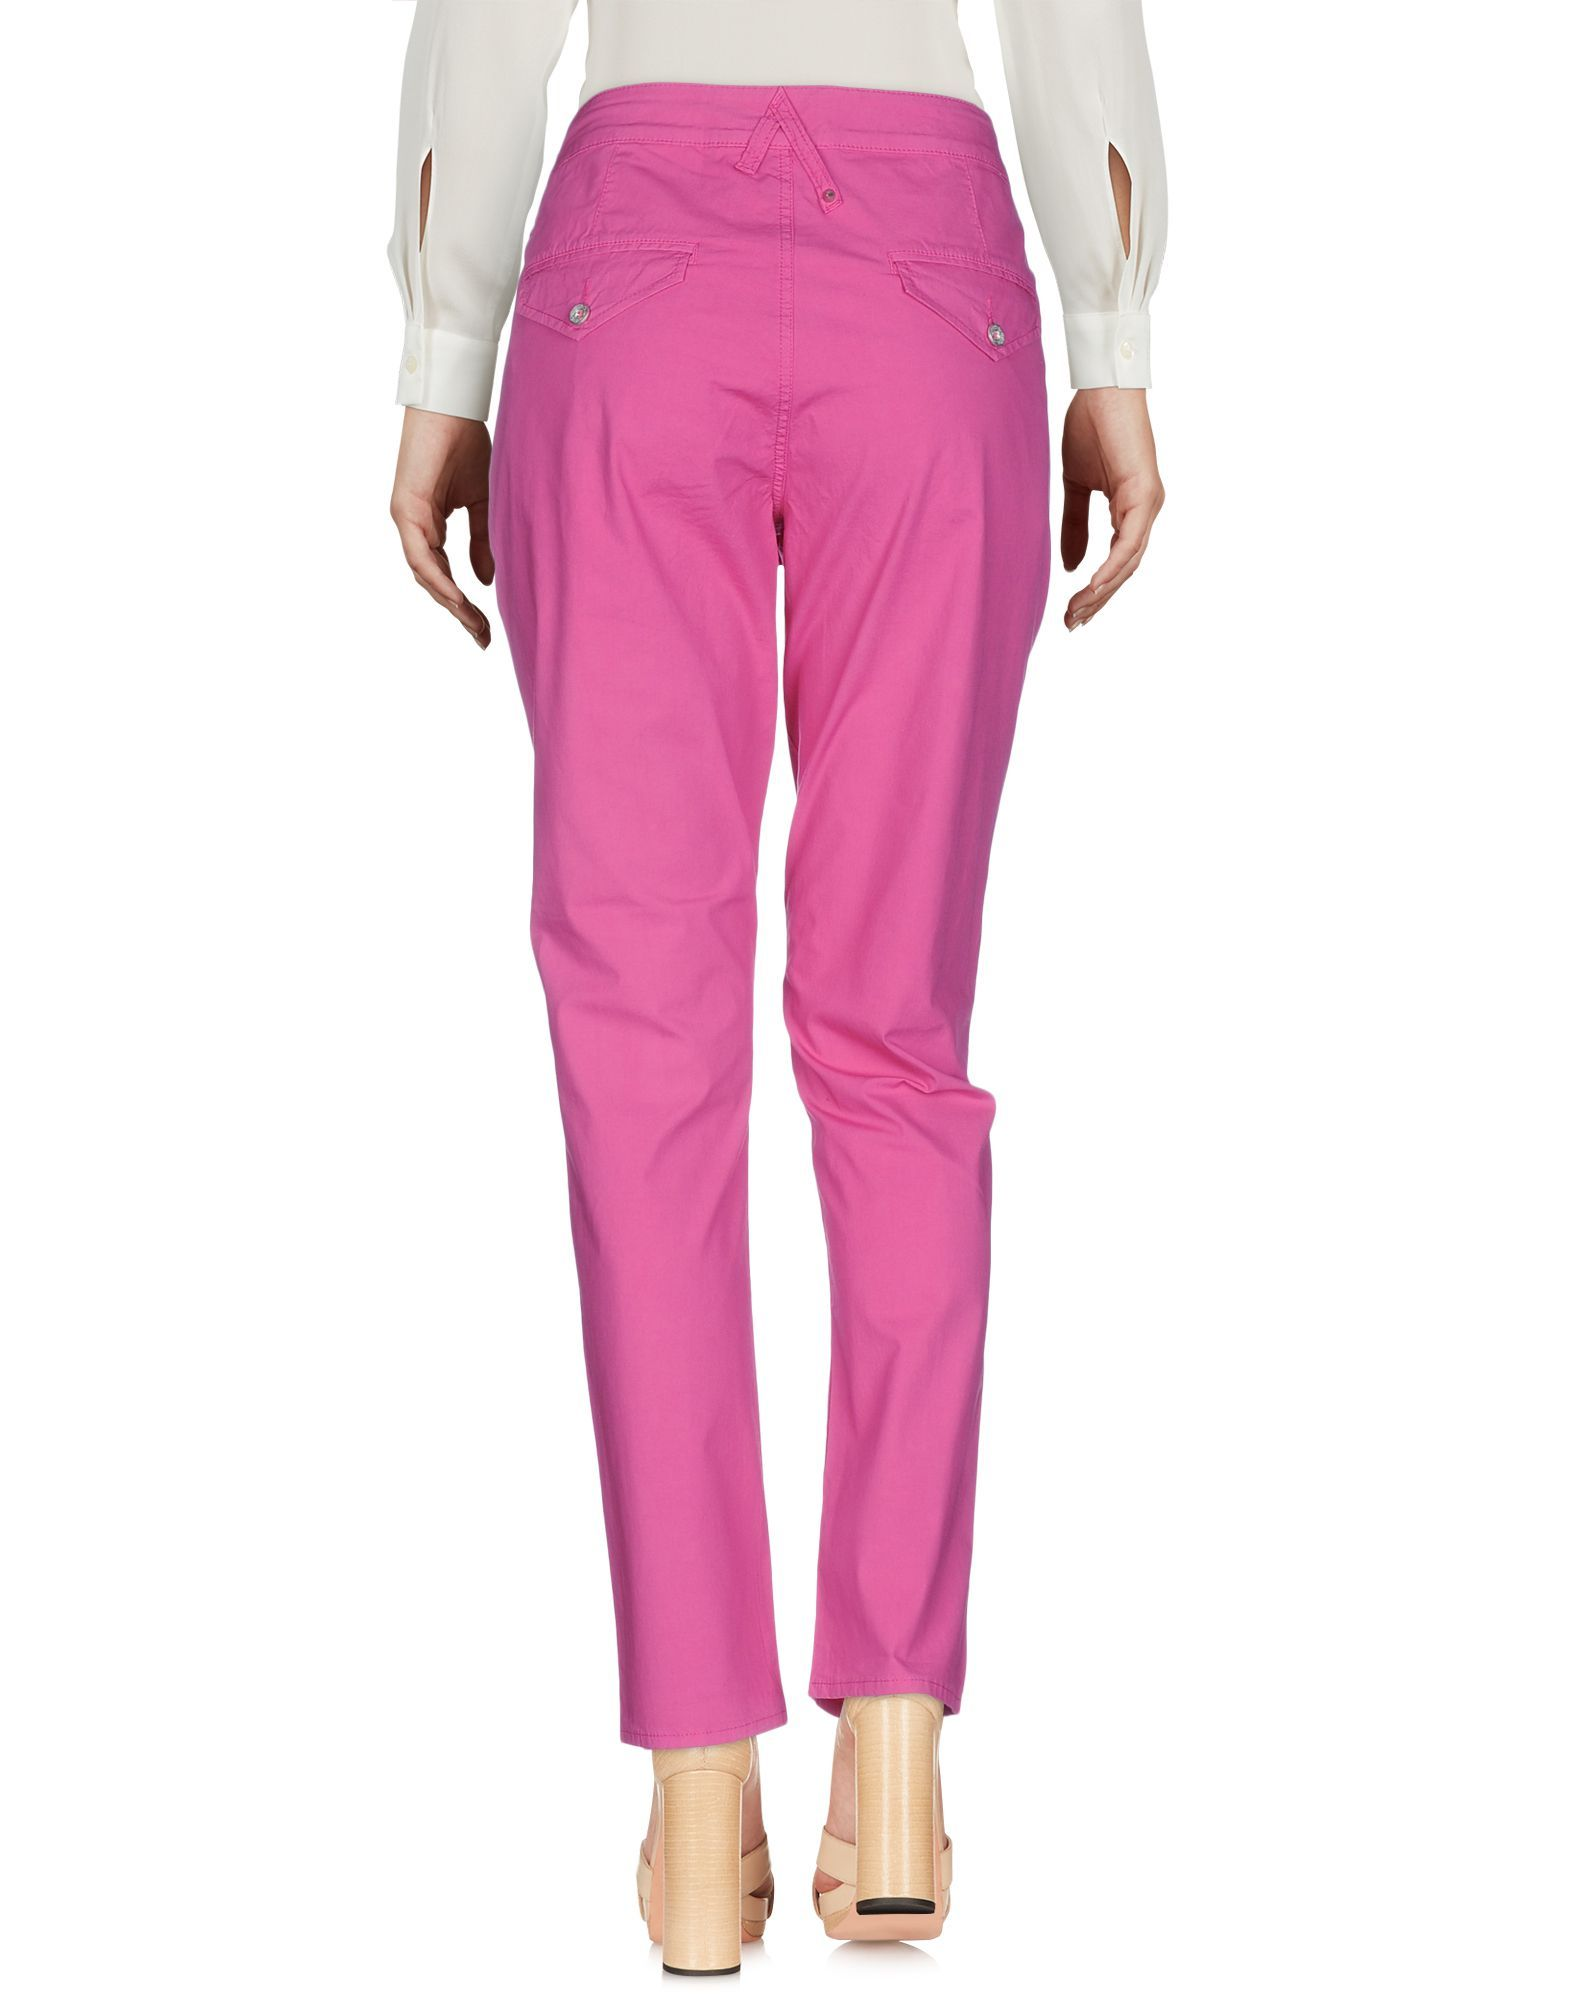 Trousers Women's Cycle Fuchsia Cotton